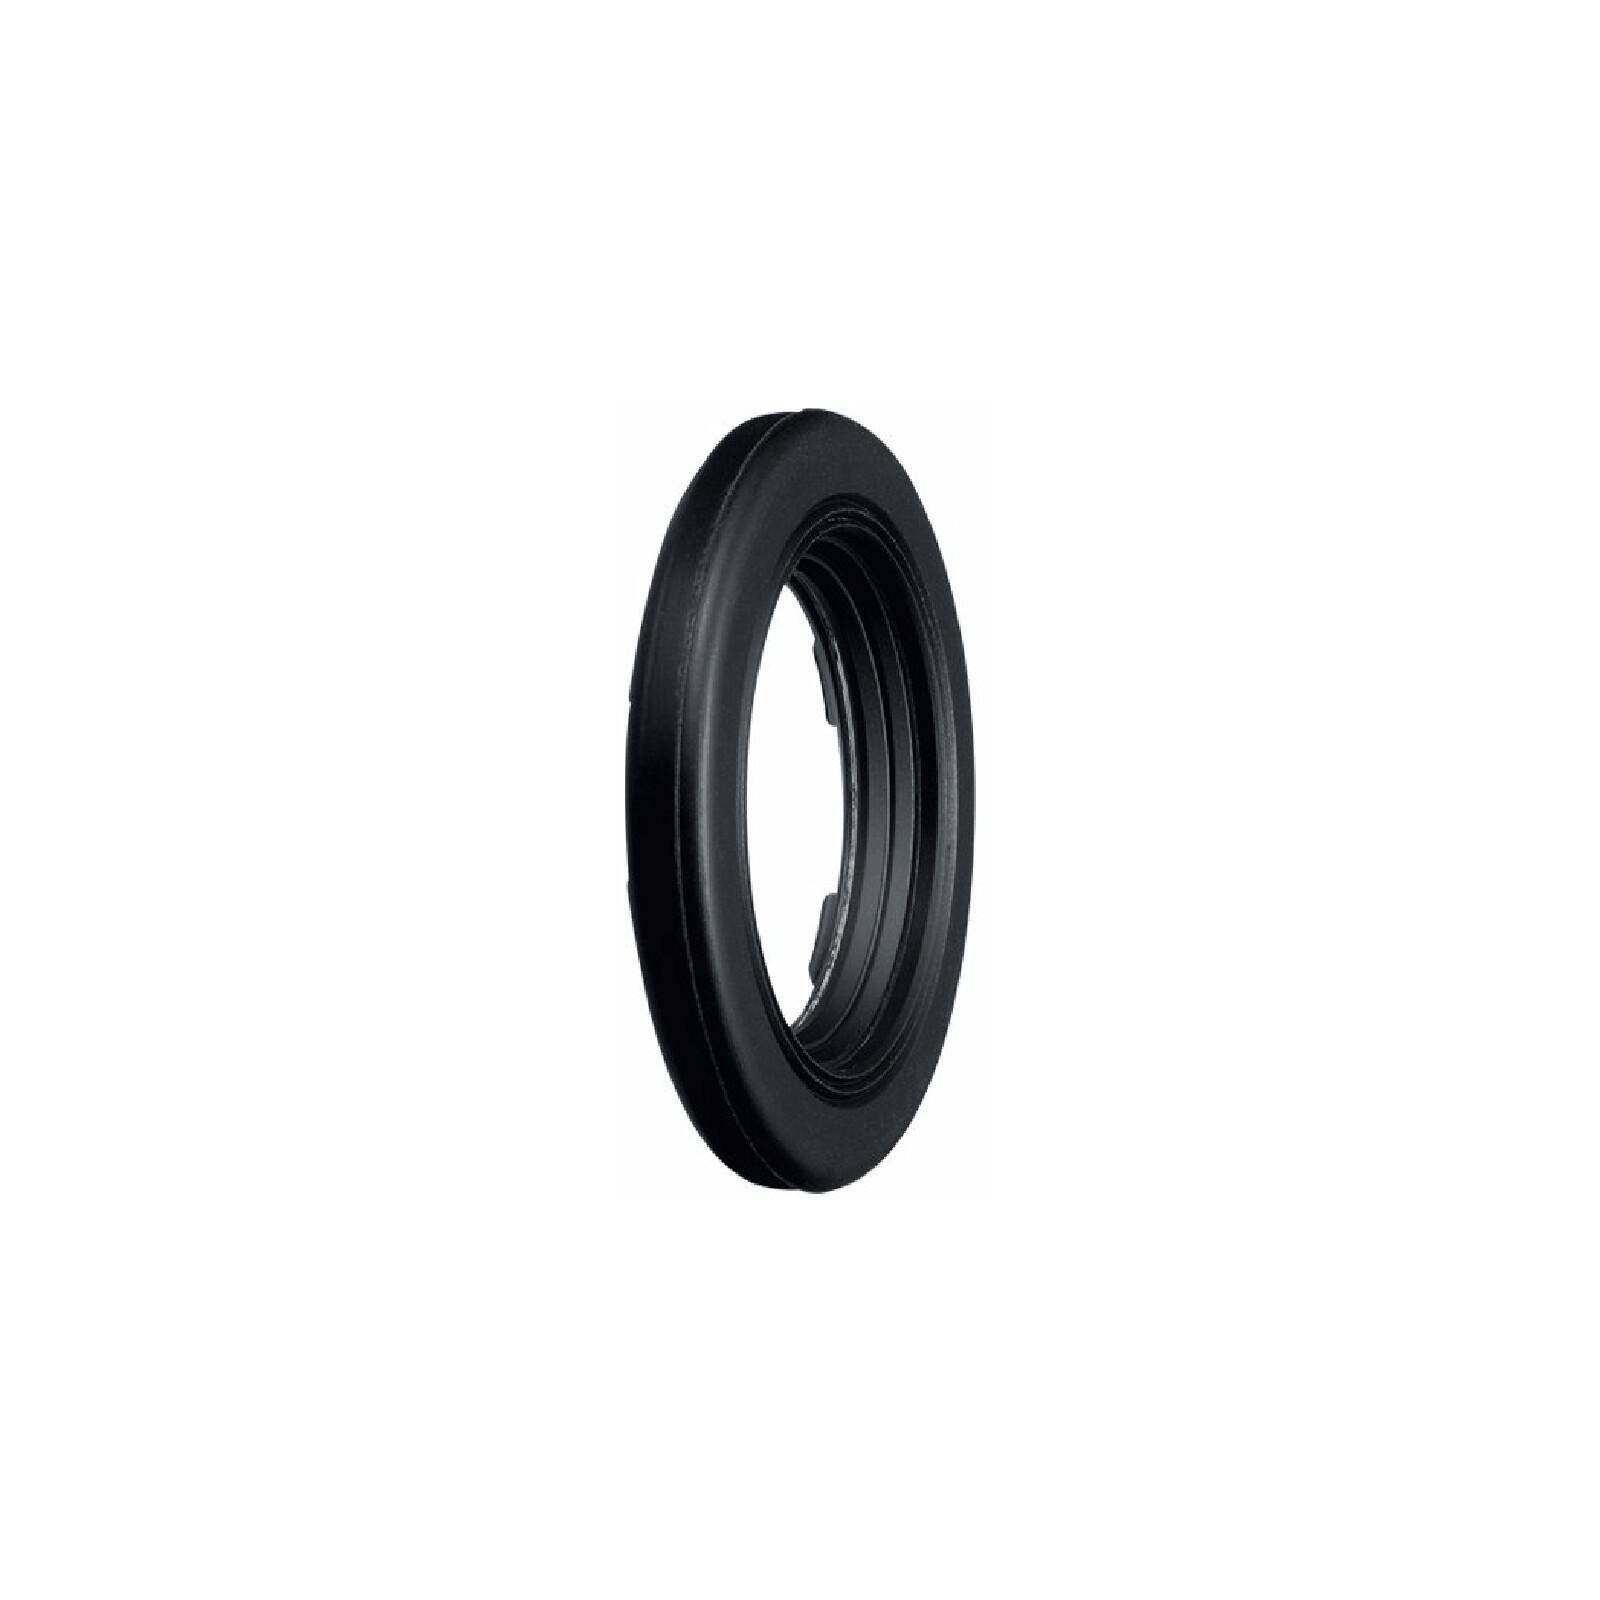 Nikon DK-17C +1 Korrekturlinse